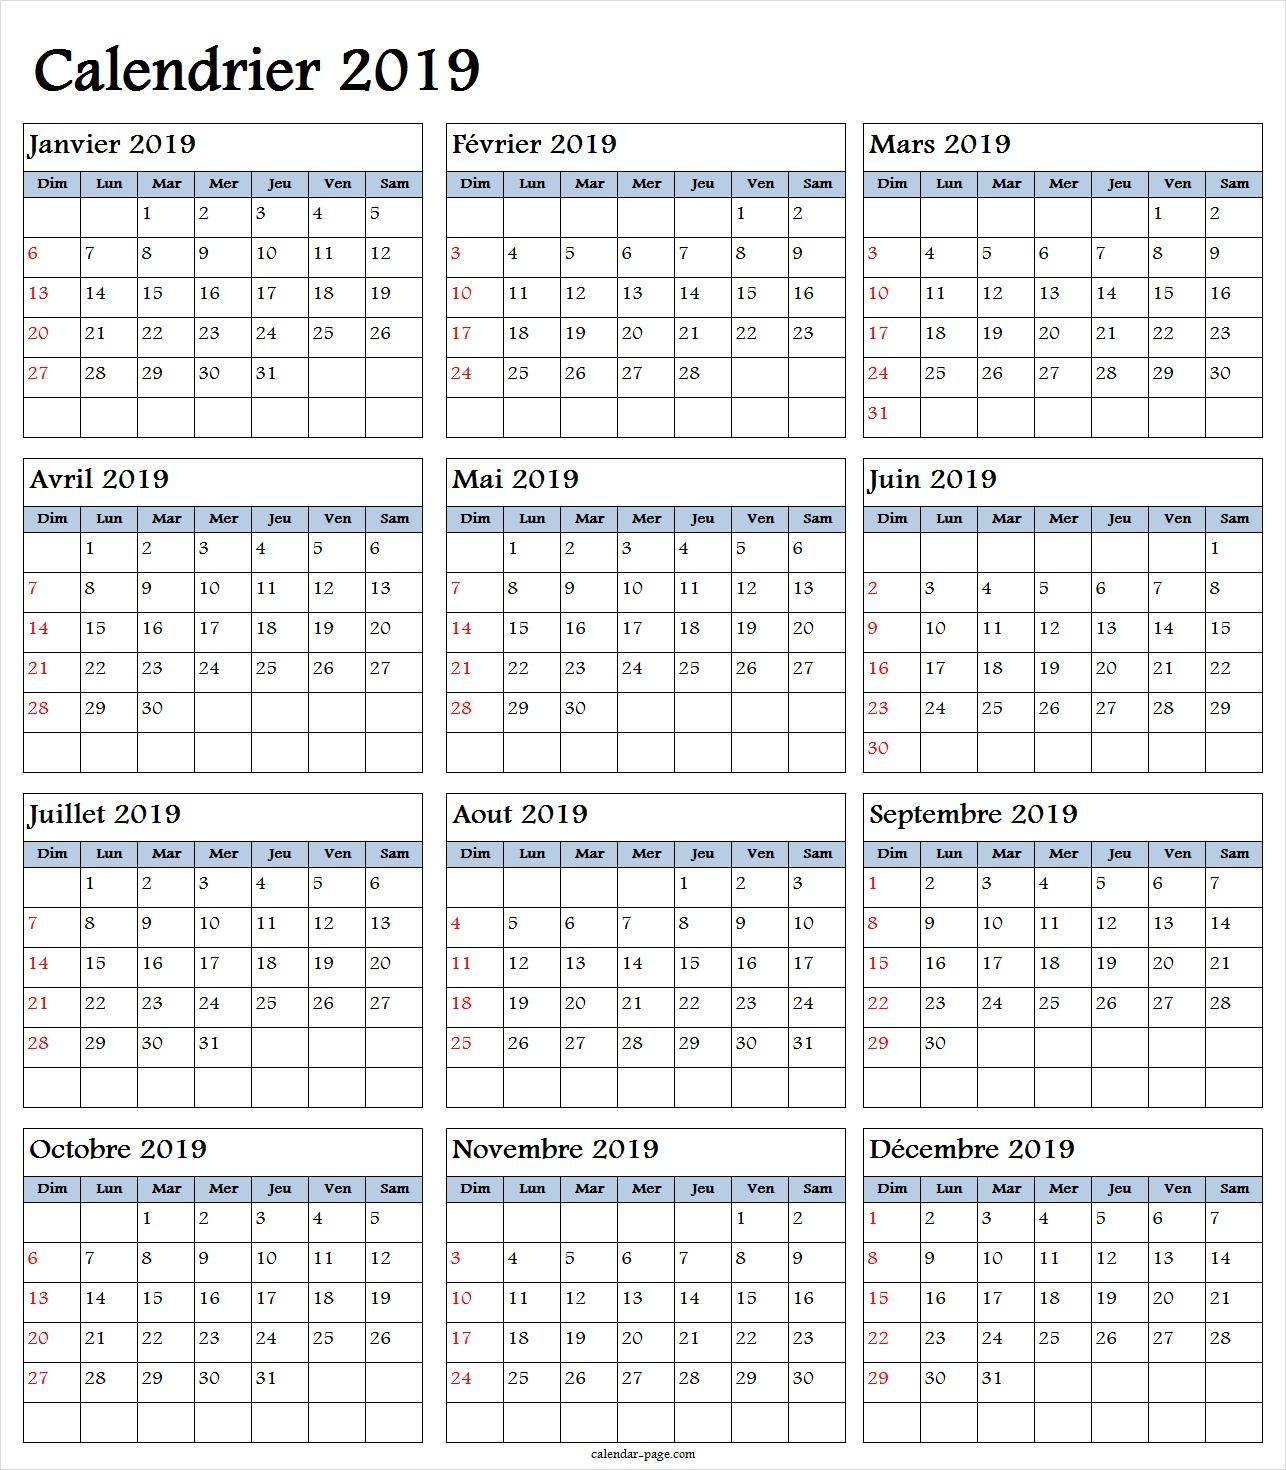 Calendrier Annuel 2019 | Calendrier Annually 2019 À Imprimer dedans Calendrier Annuel 2019 À Imprimer Gratuit